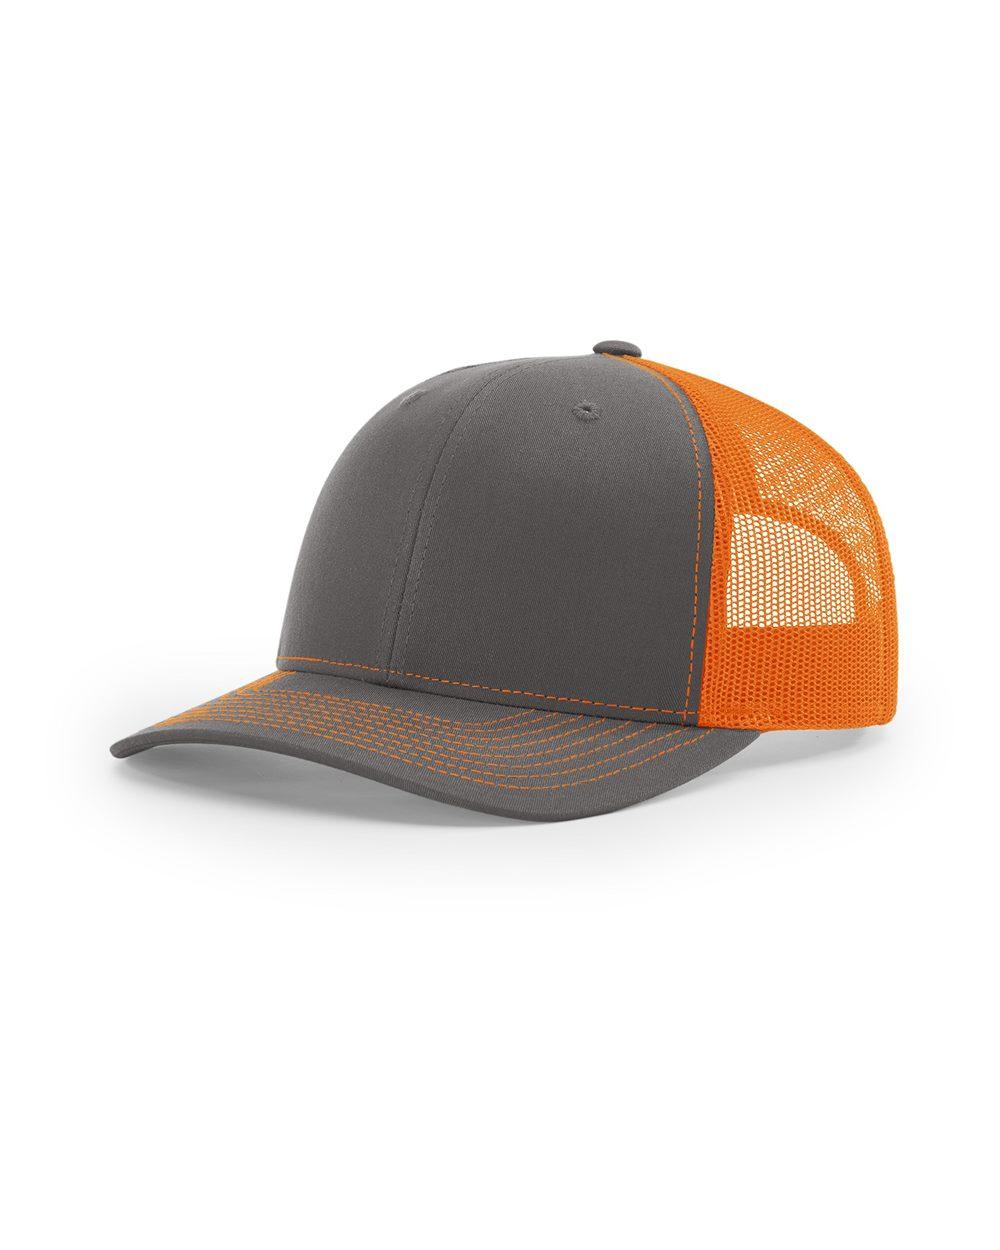 Charcoal/ Orange